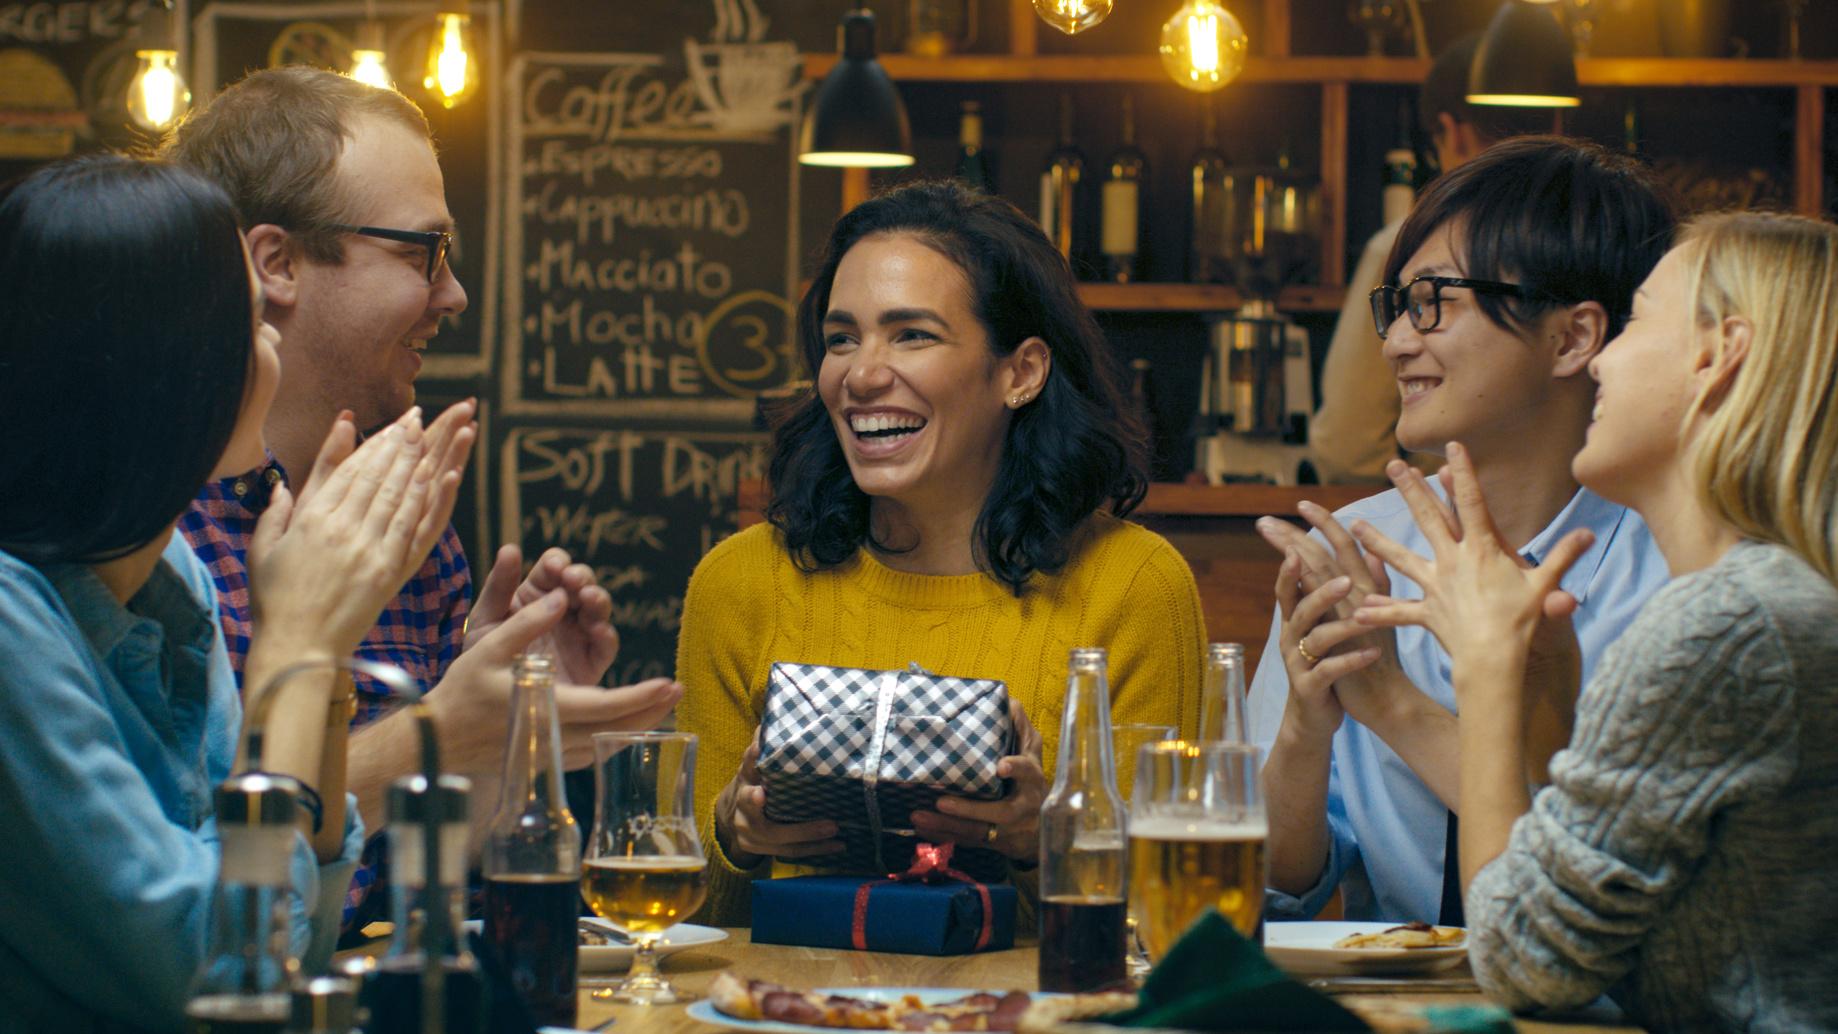 aniversariantes-comemorando-no-bar